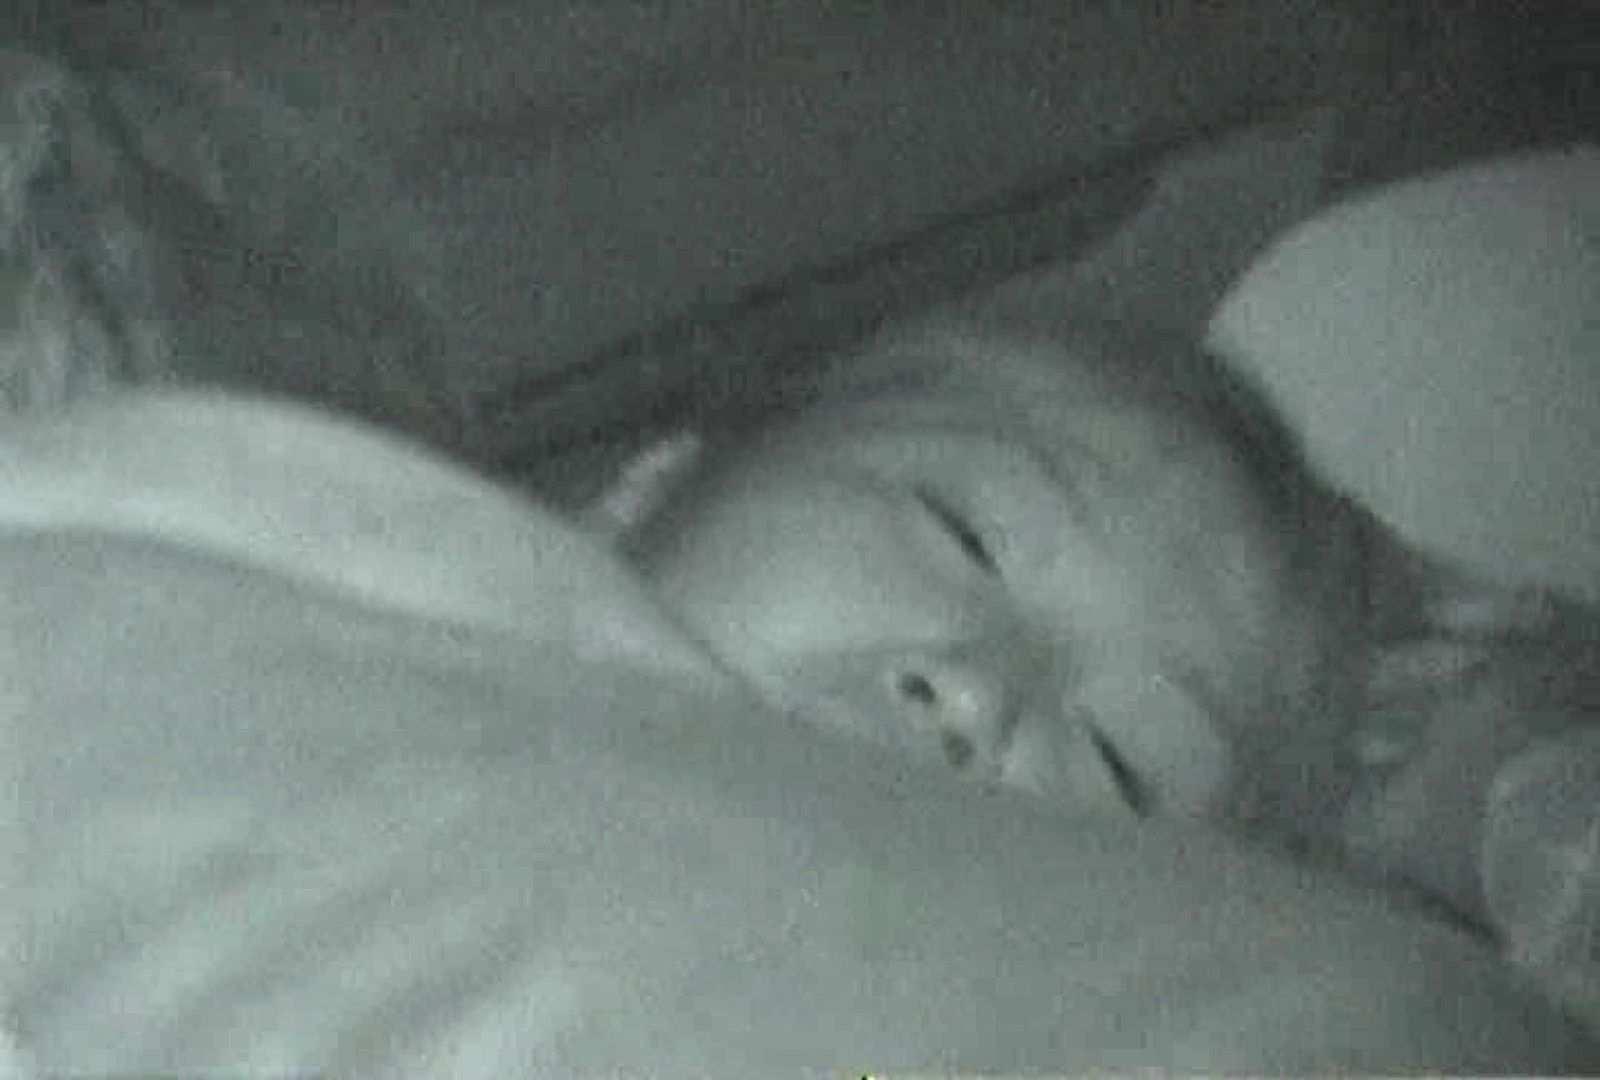 充血監督の深夜の運動会Vol.89 熟女 エロ無料画像 55PIX 23